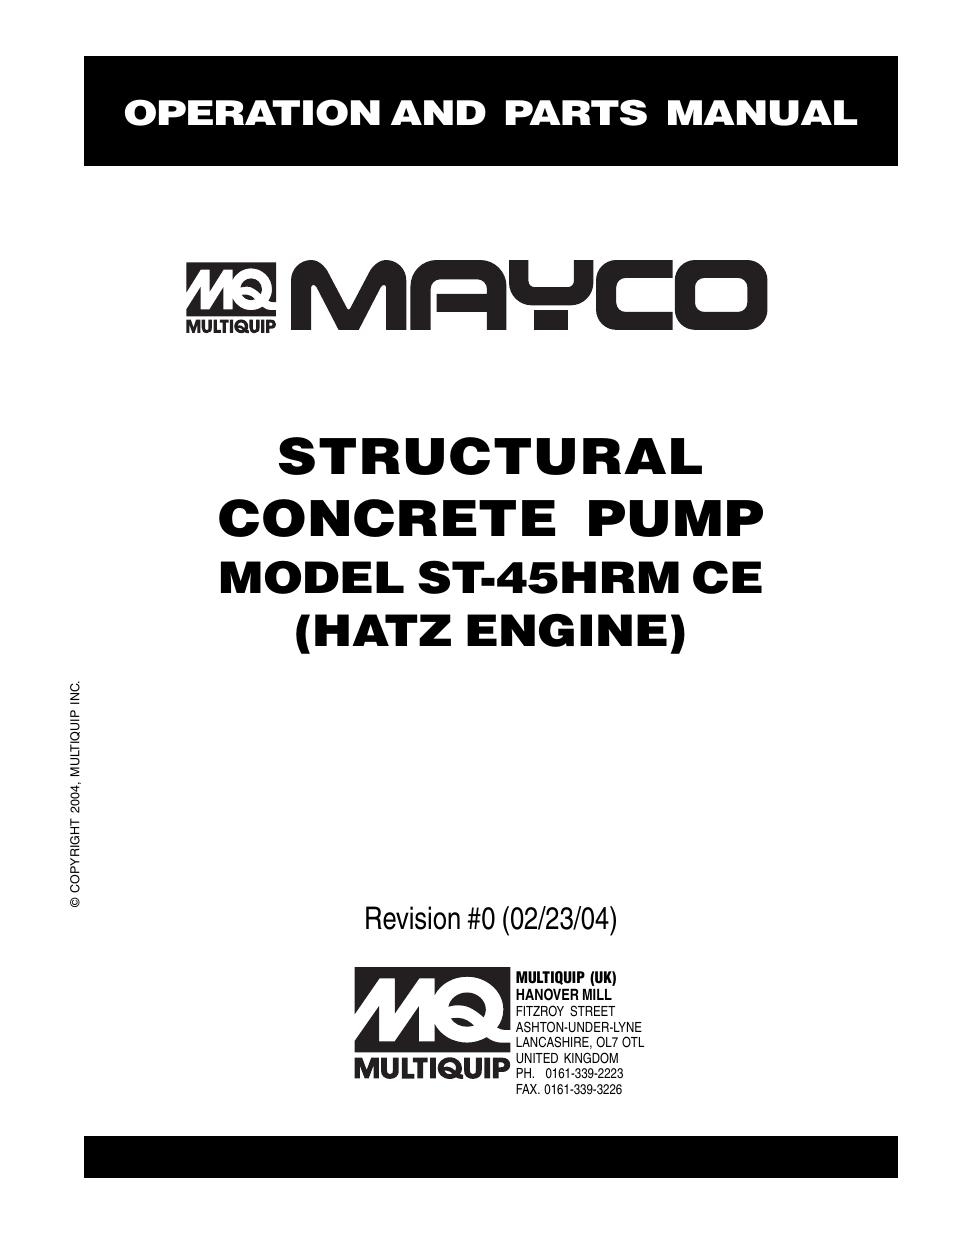 Multiquip Mayco Structural Concrete Pump ST-45HRM CE User